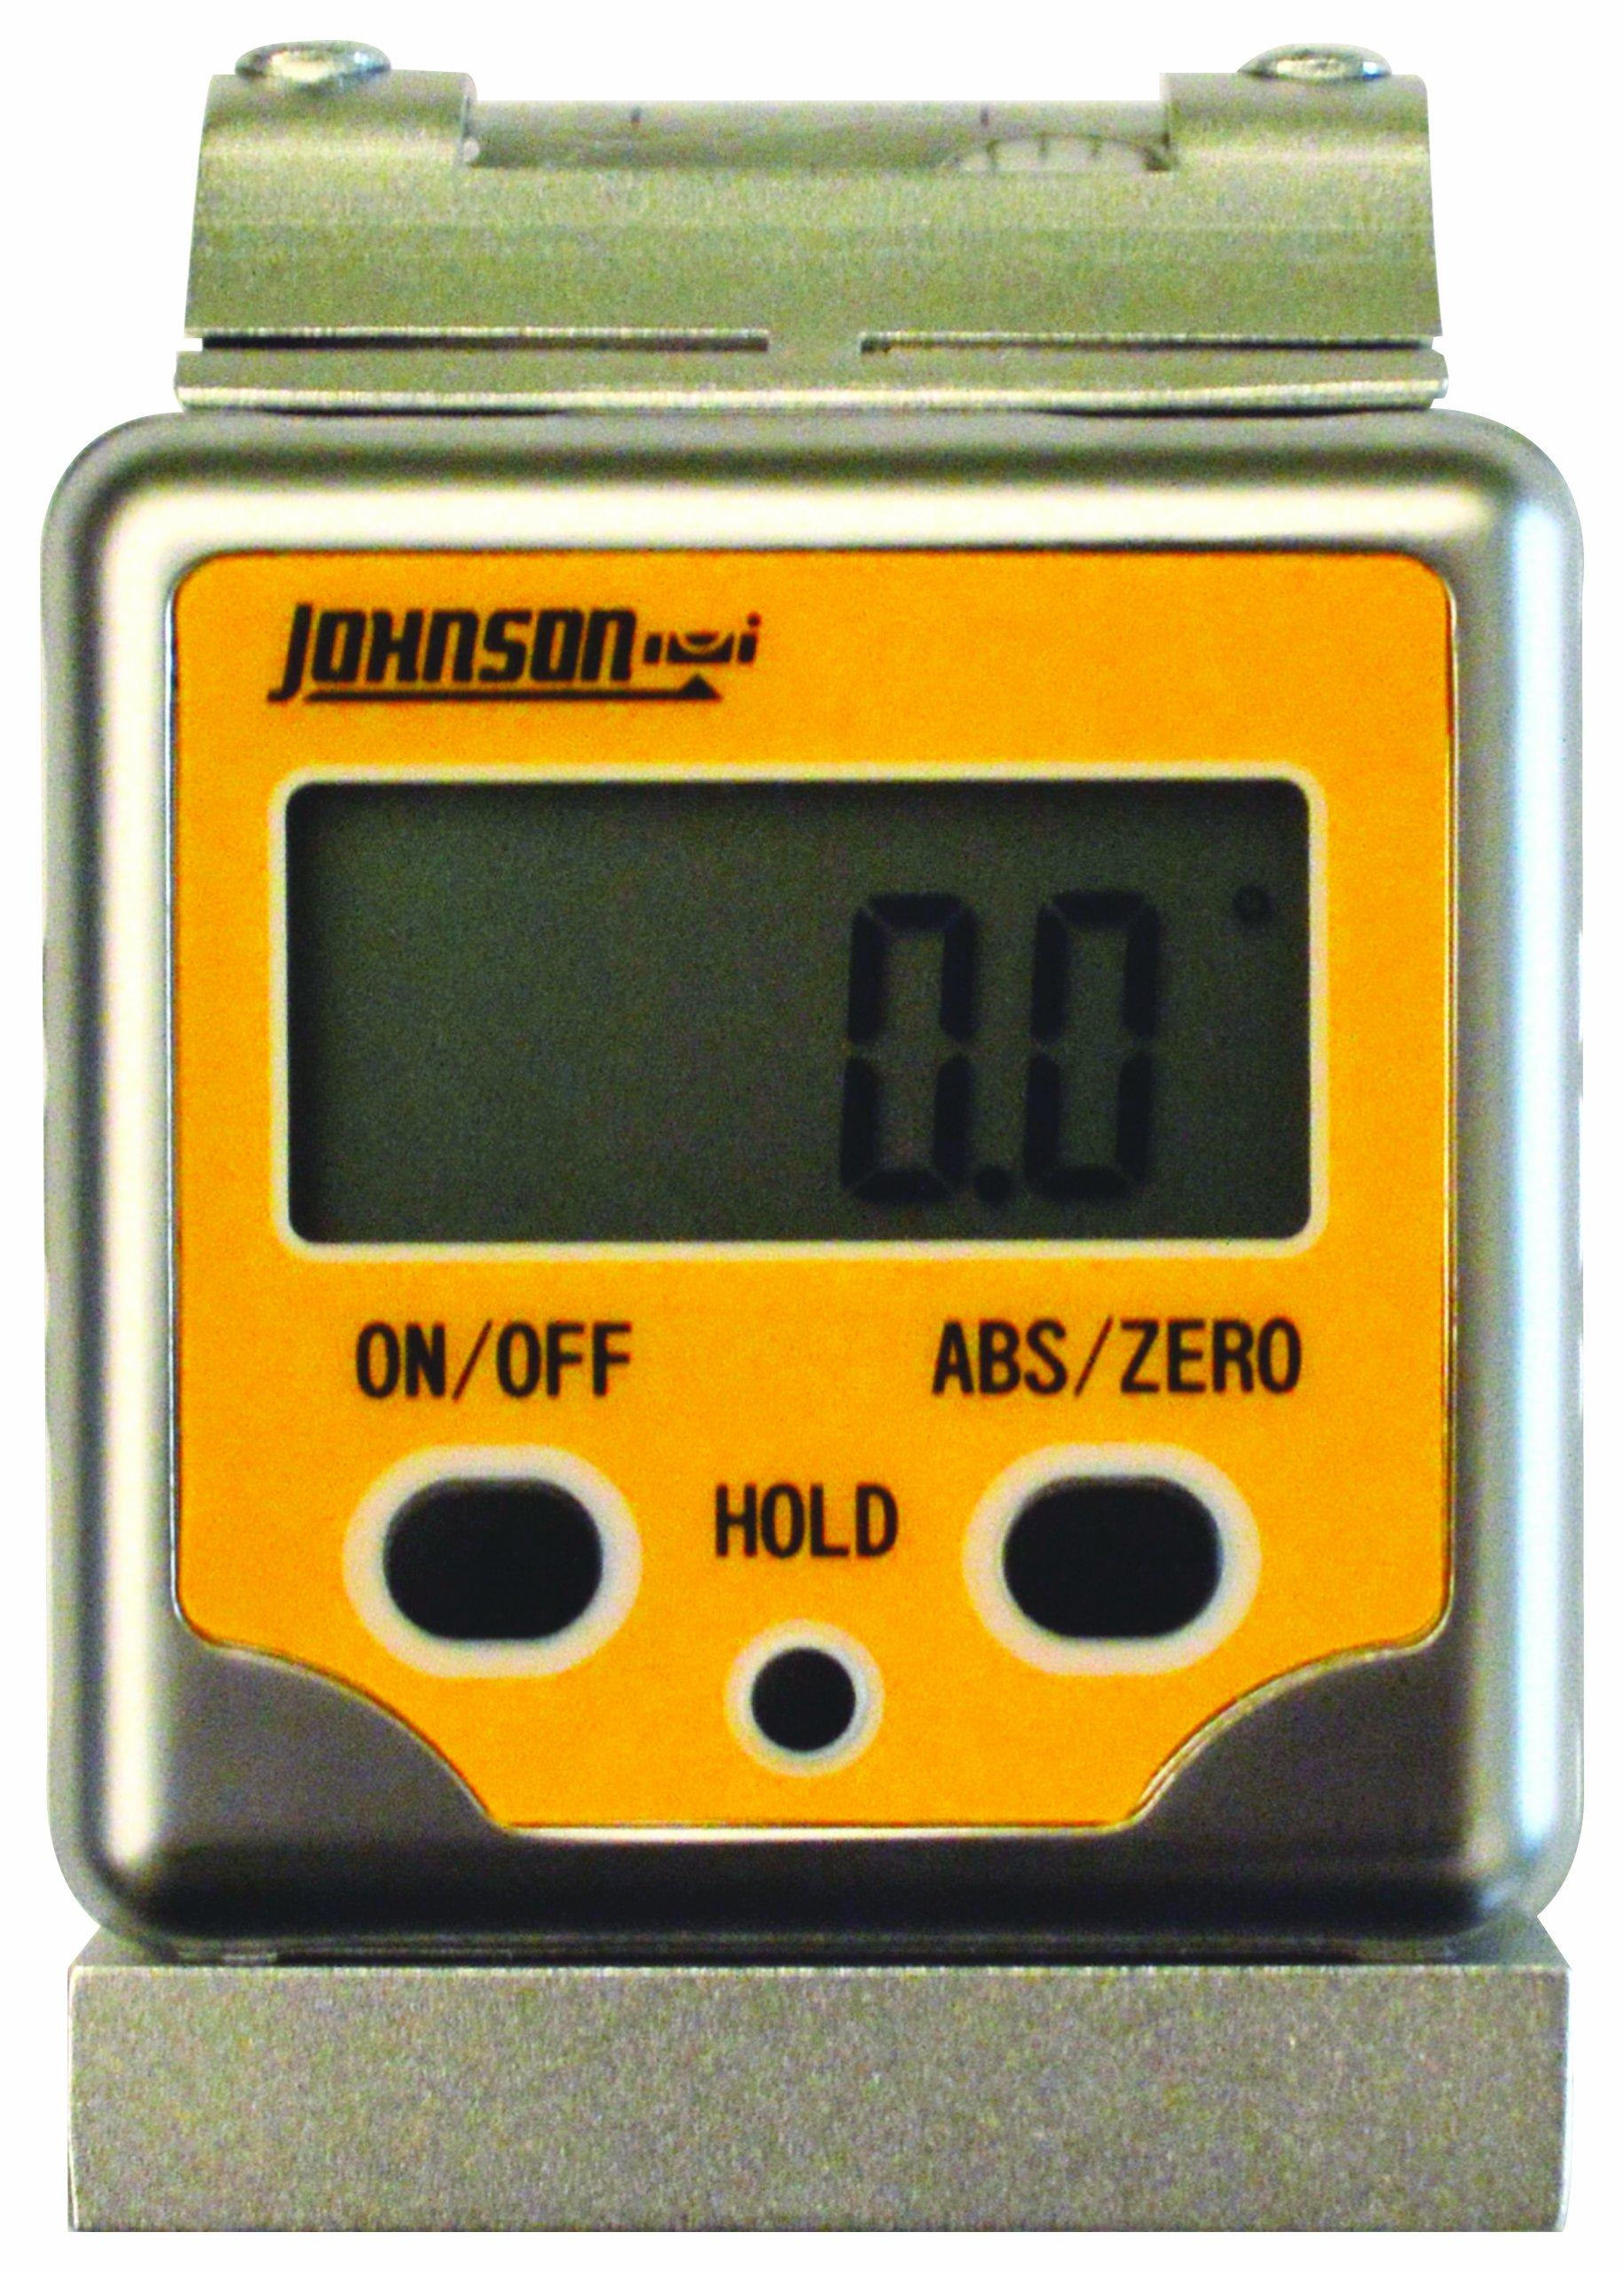 Johnson Level & Tool 1886-0400 Magnetic Digital Angle Locator